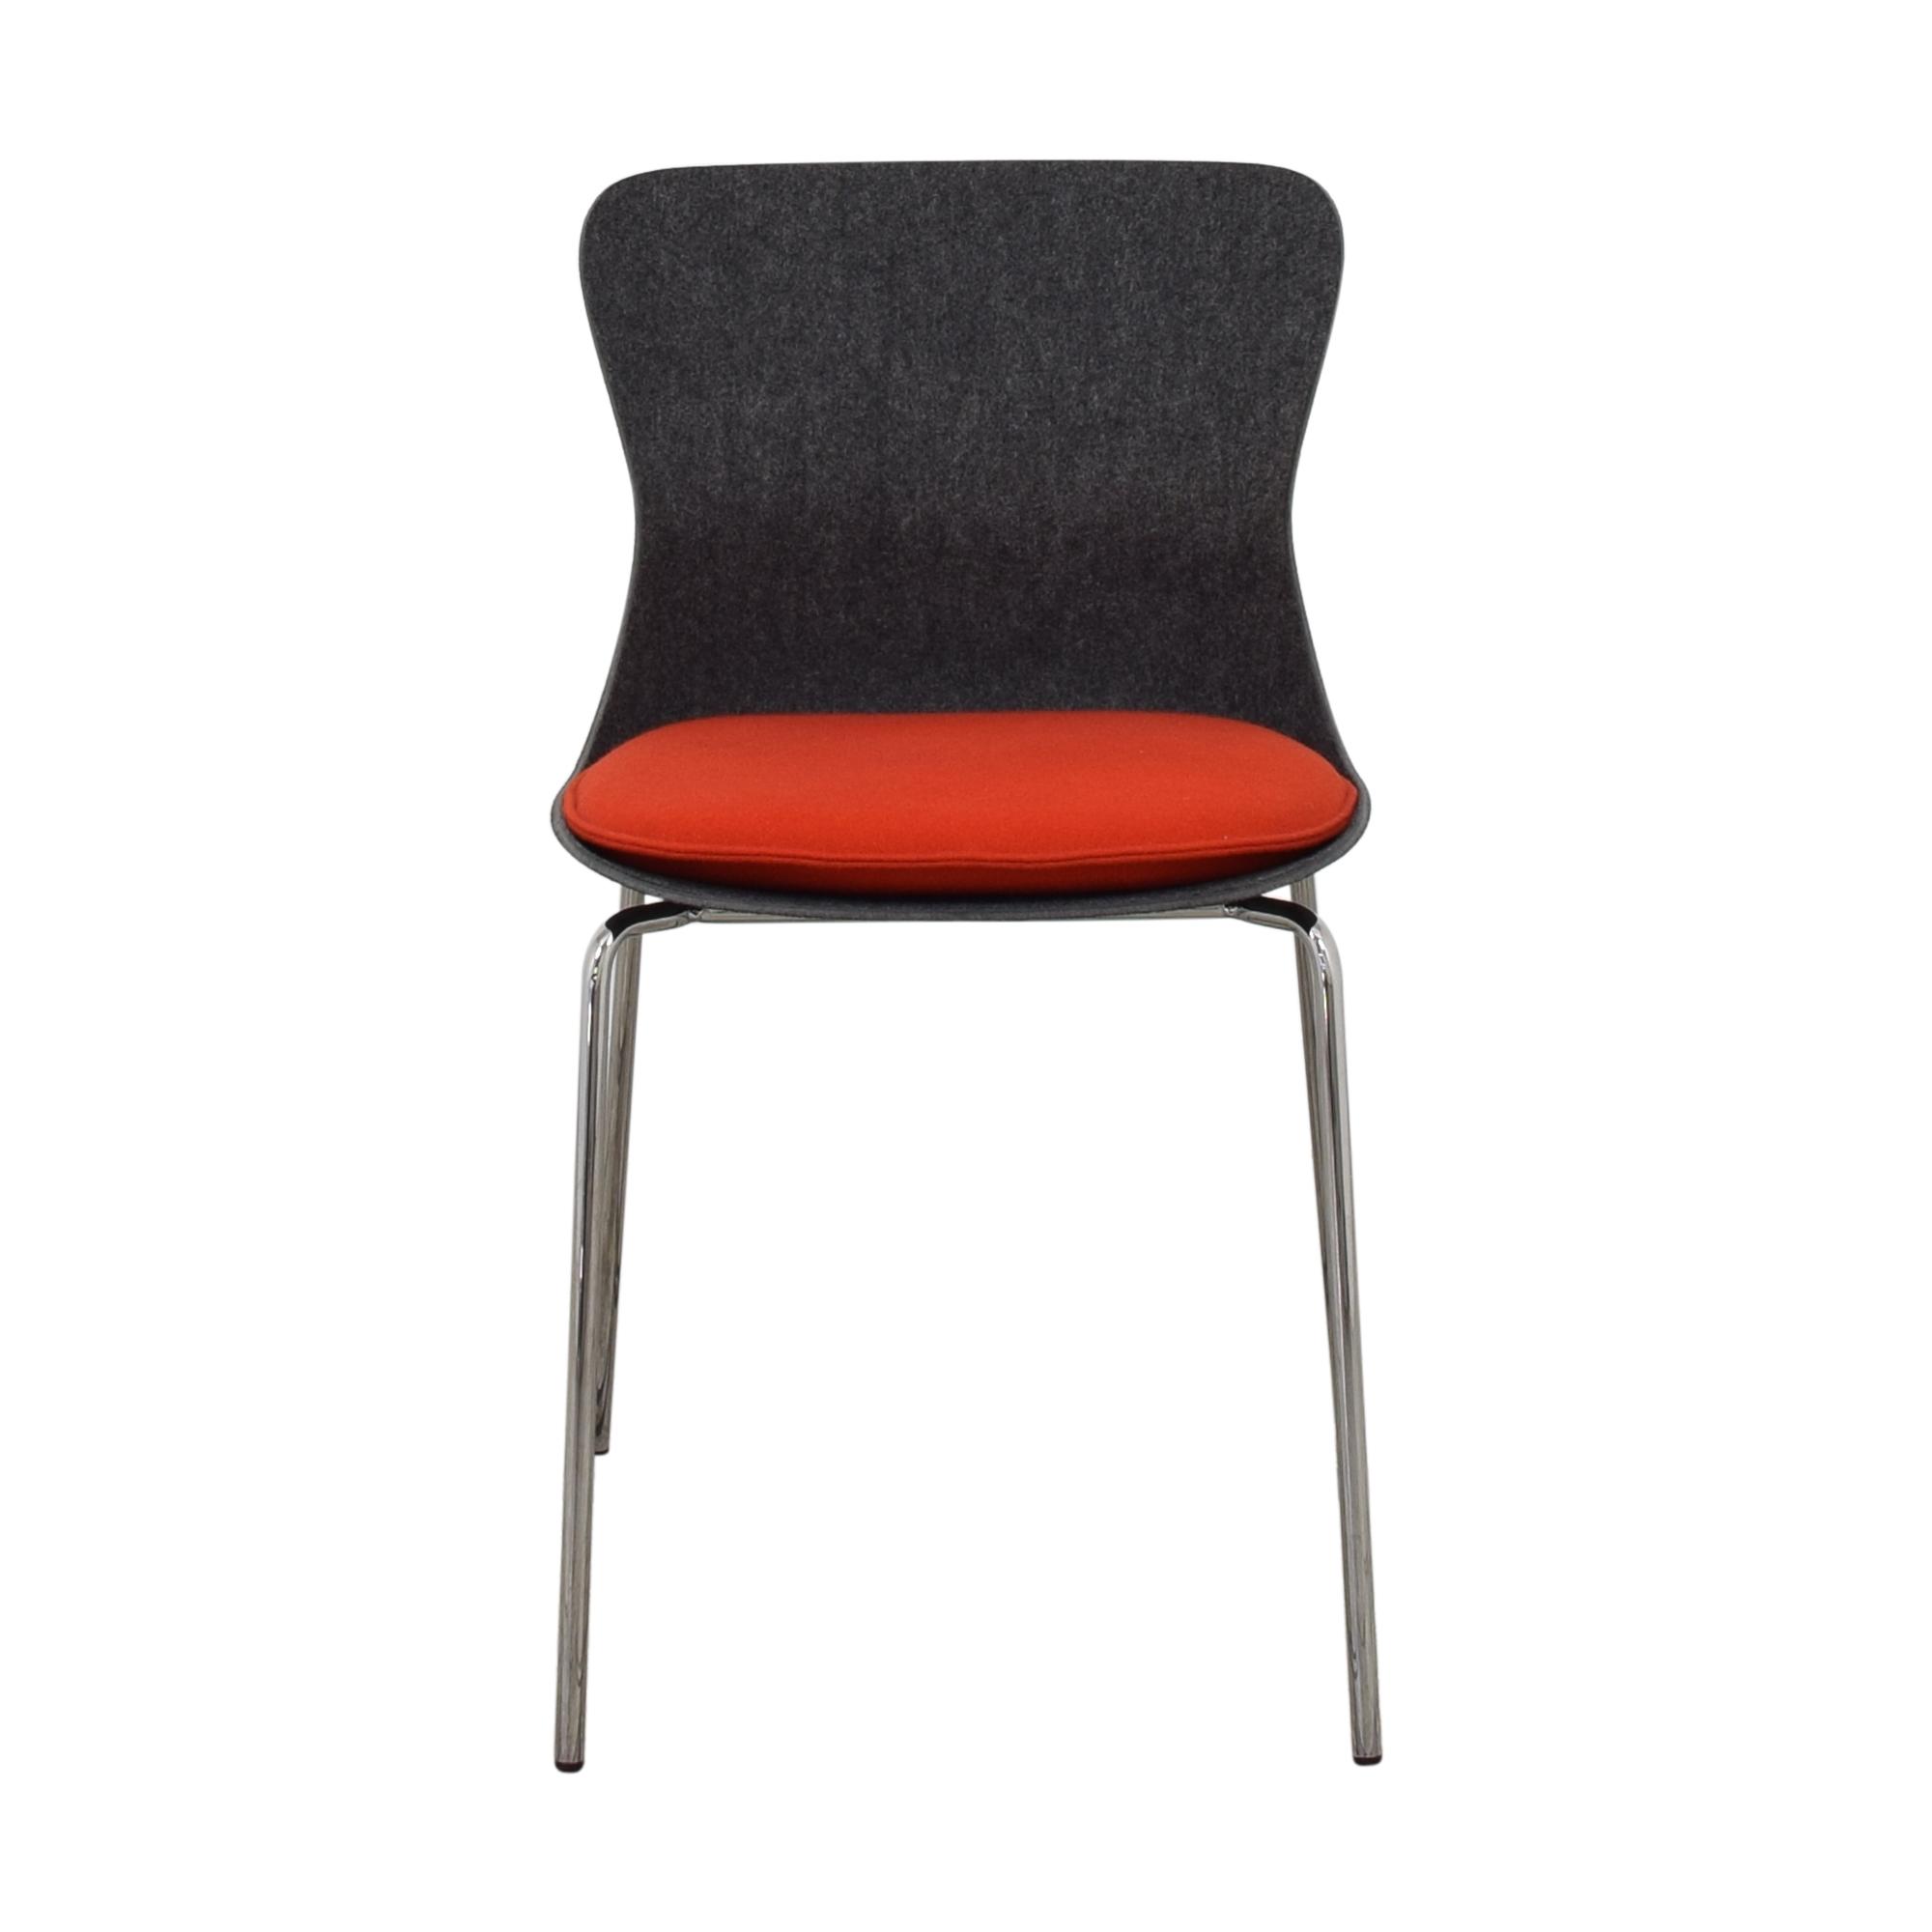 shop Ligne Roset Ligne Roset Ettoriano Dining Chair online